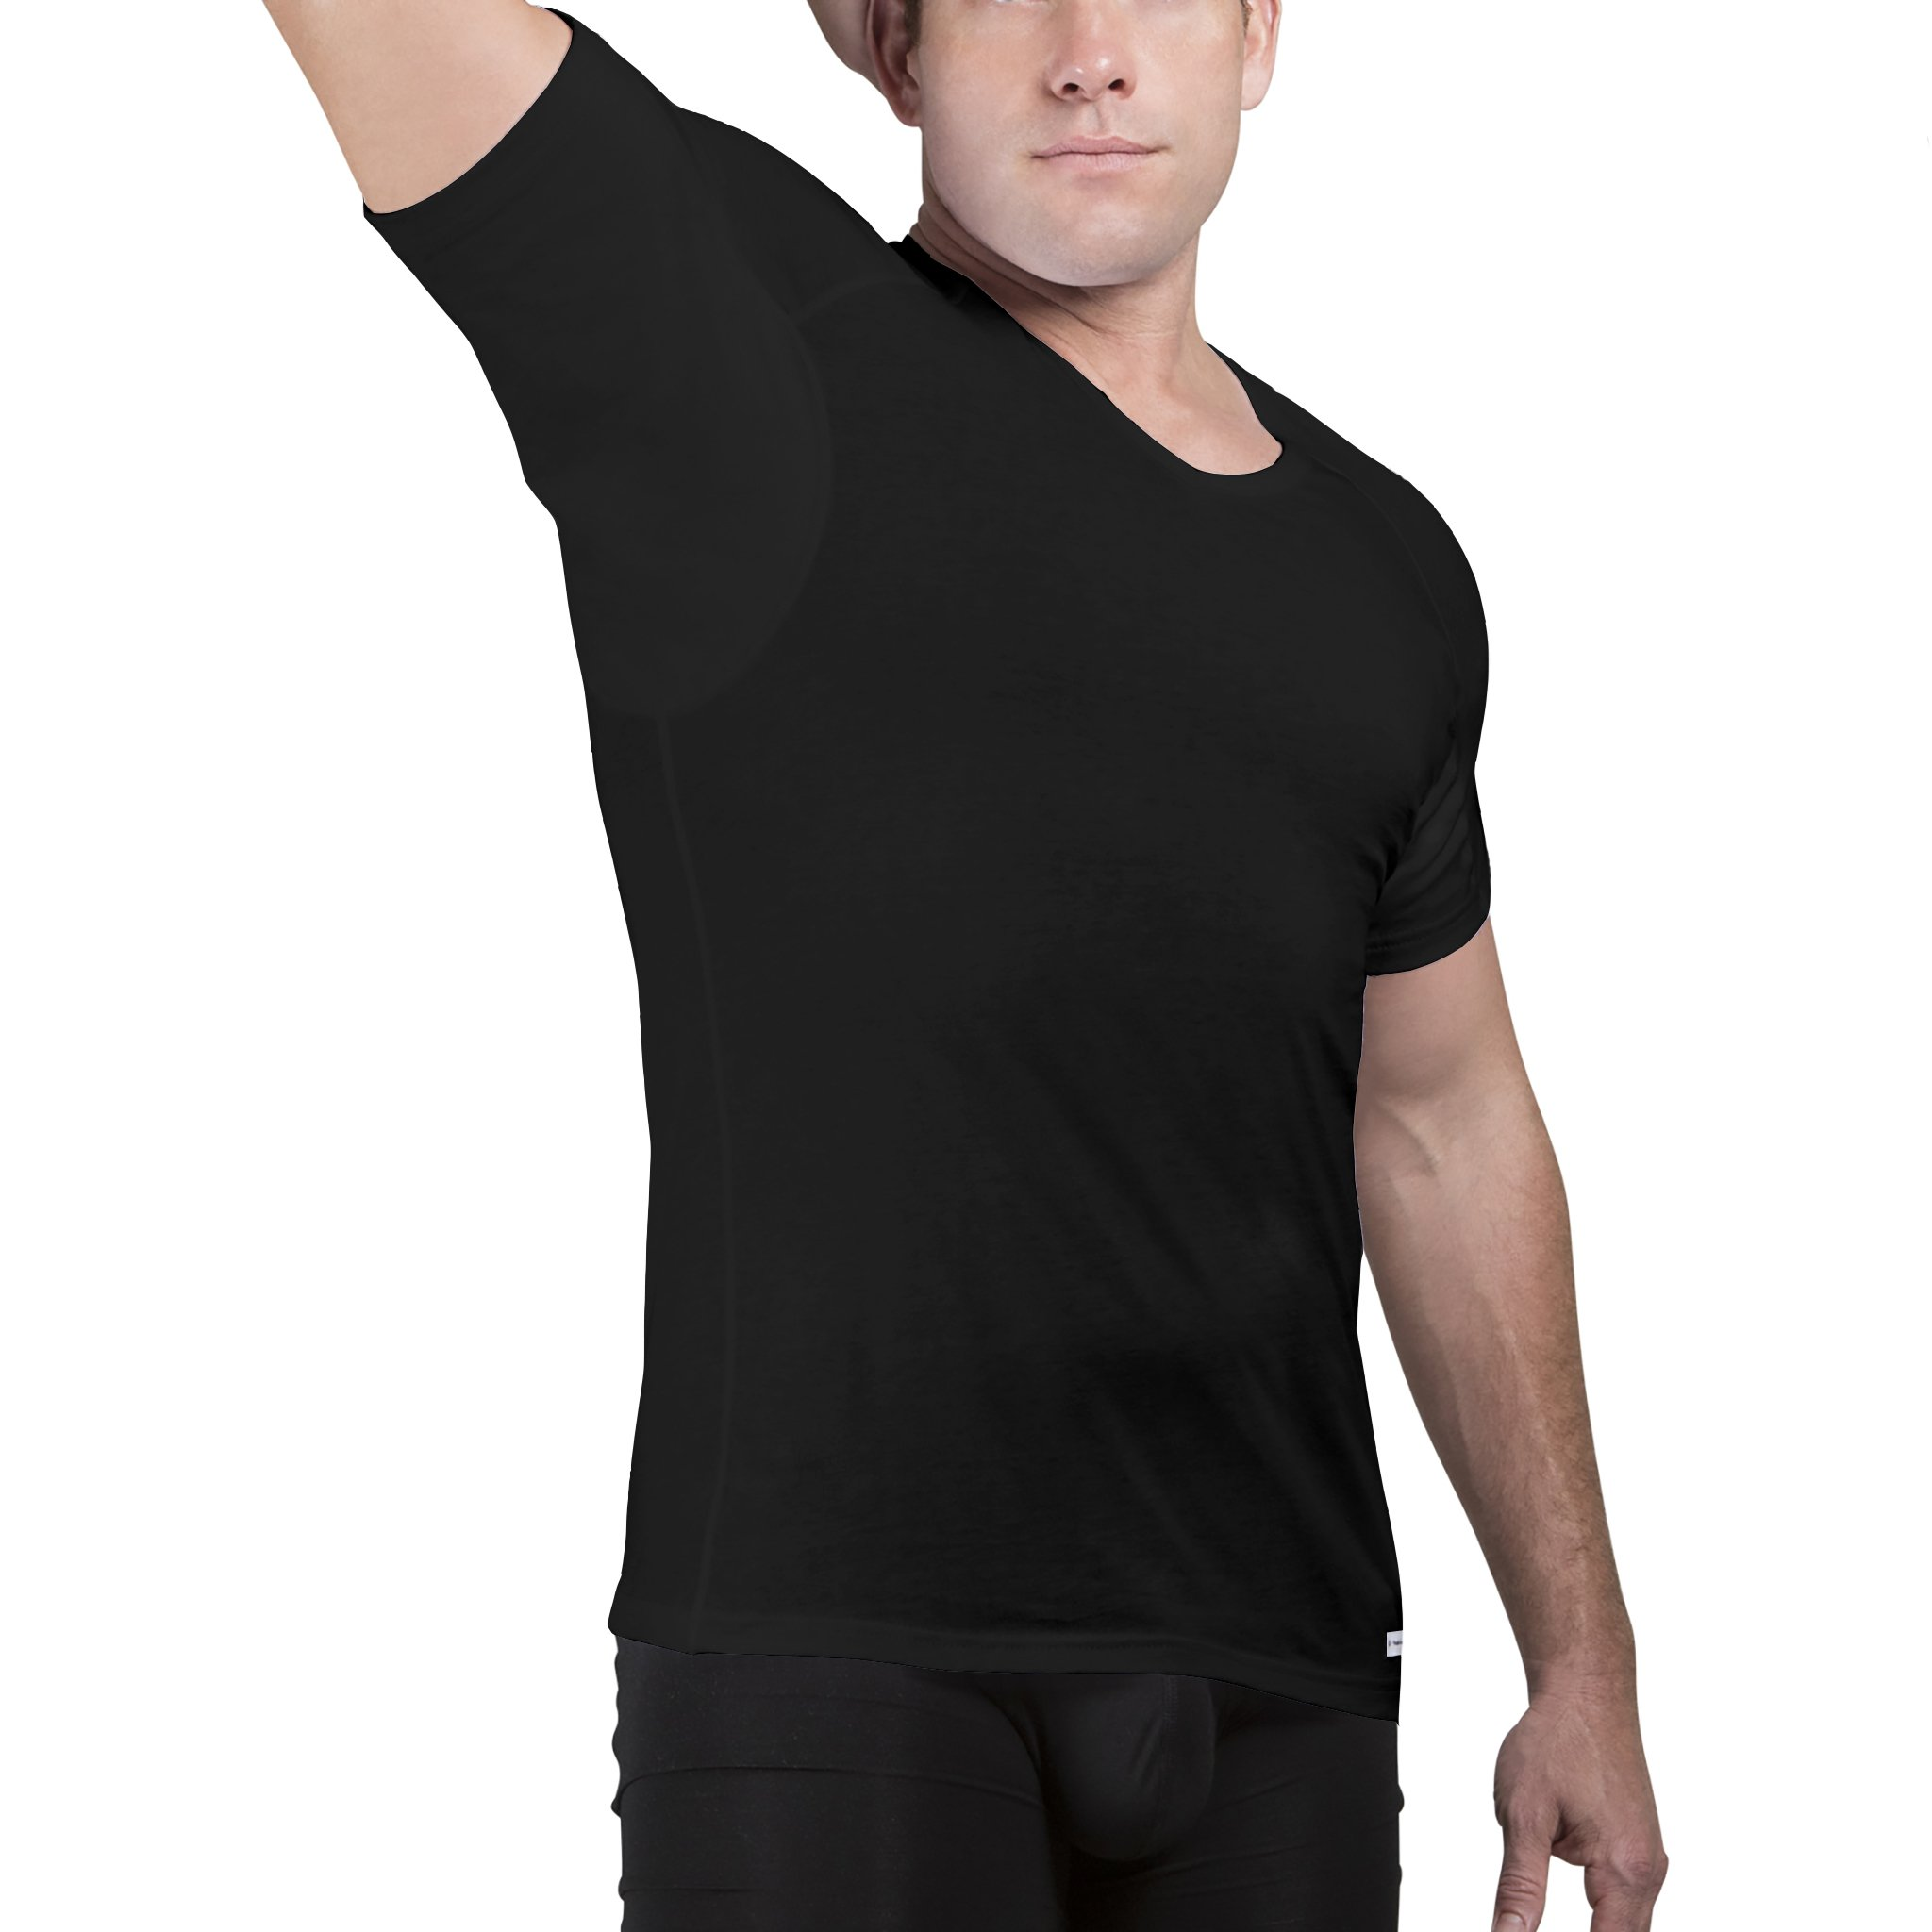 Ejis Sweatproof Undershirts for Men V Neck Cotton with Odor Fighting Silver (Medium, Black)